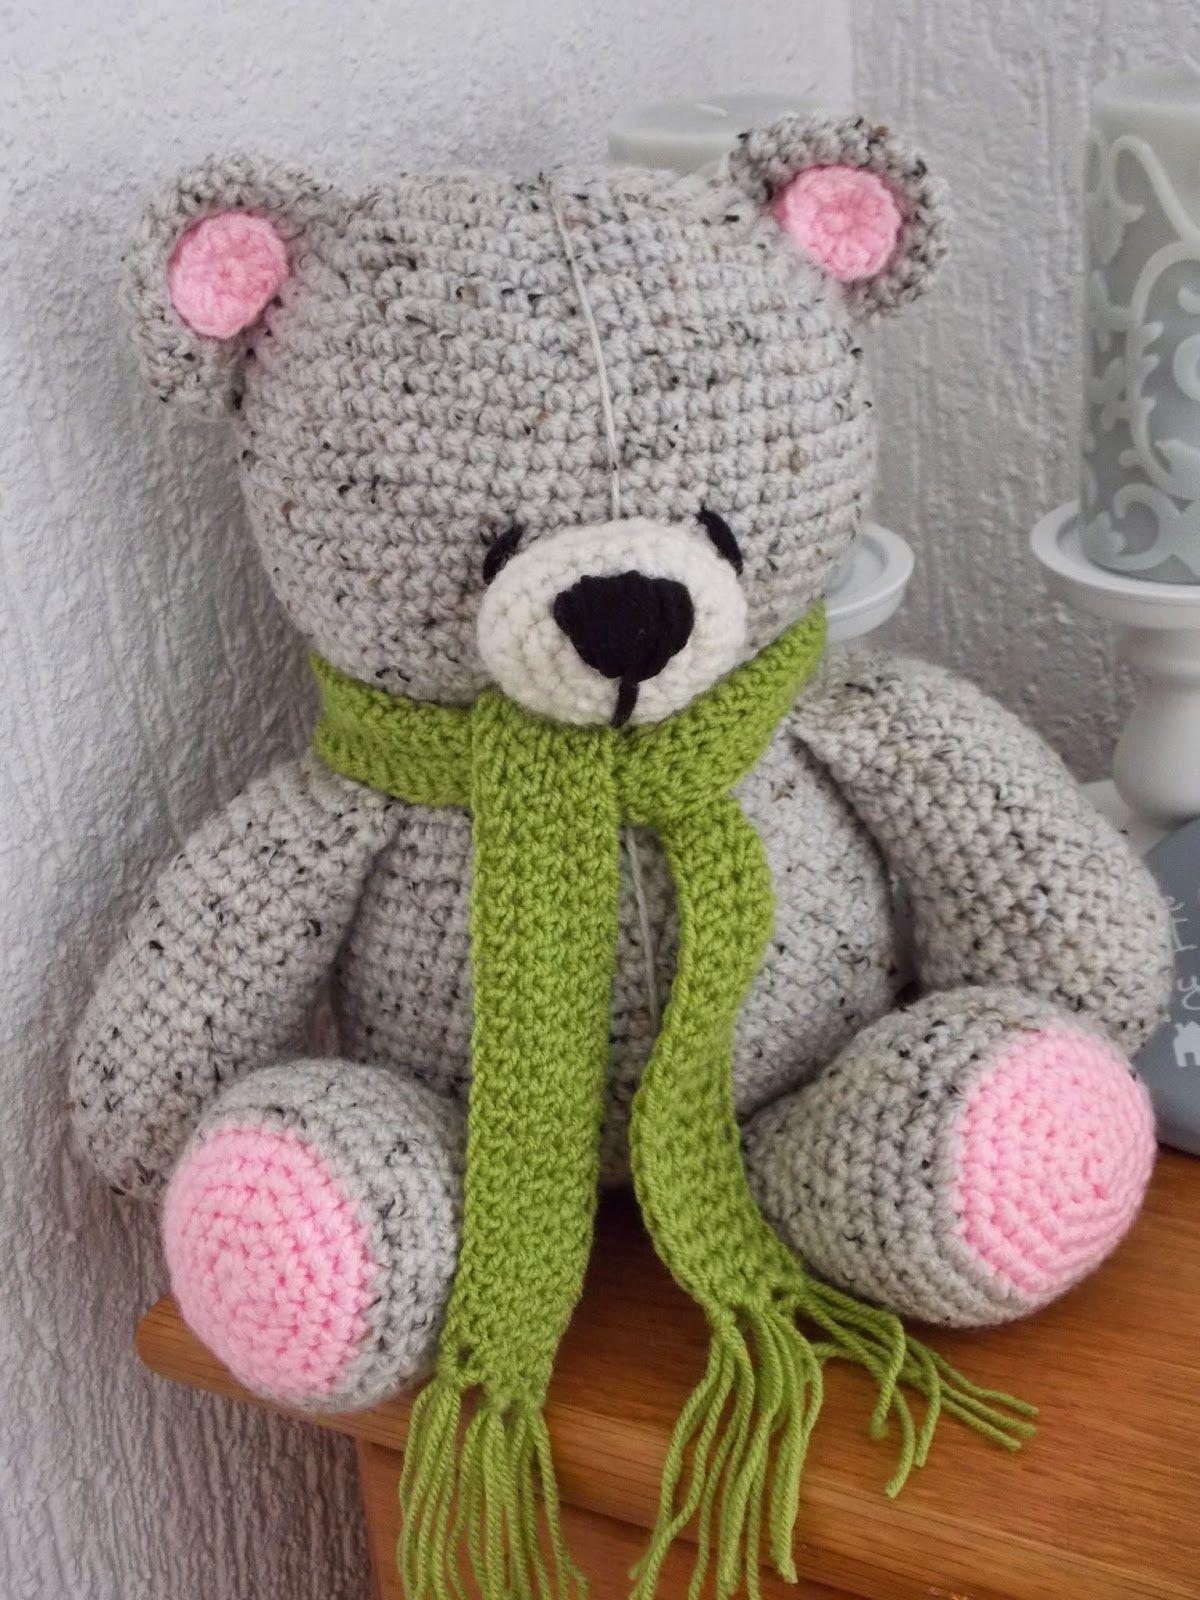 Renates Haken En Zo Forever Friends Beer Soft Crochet Toys